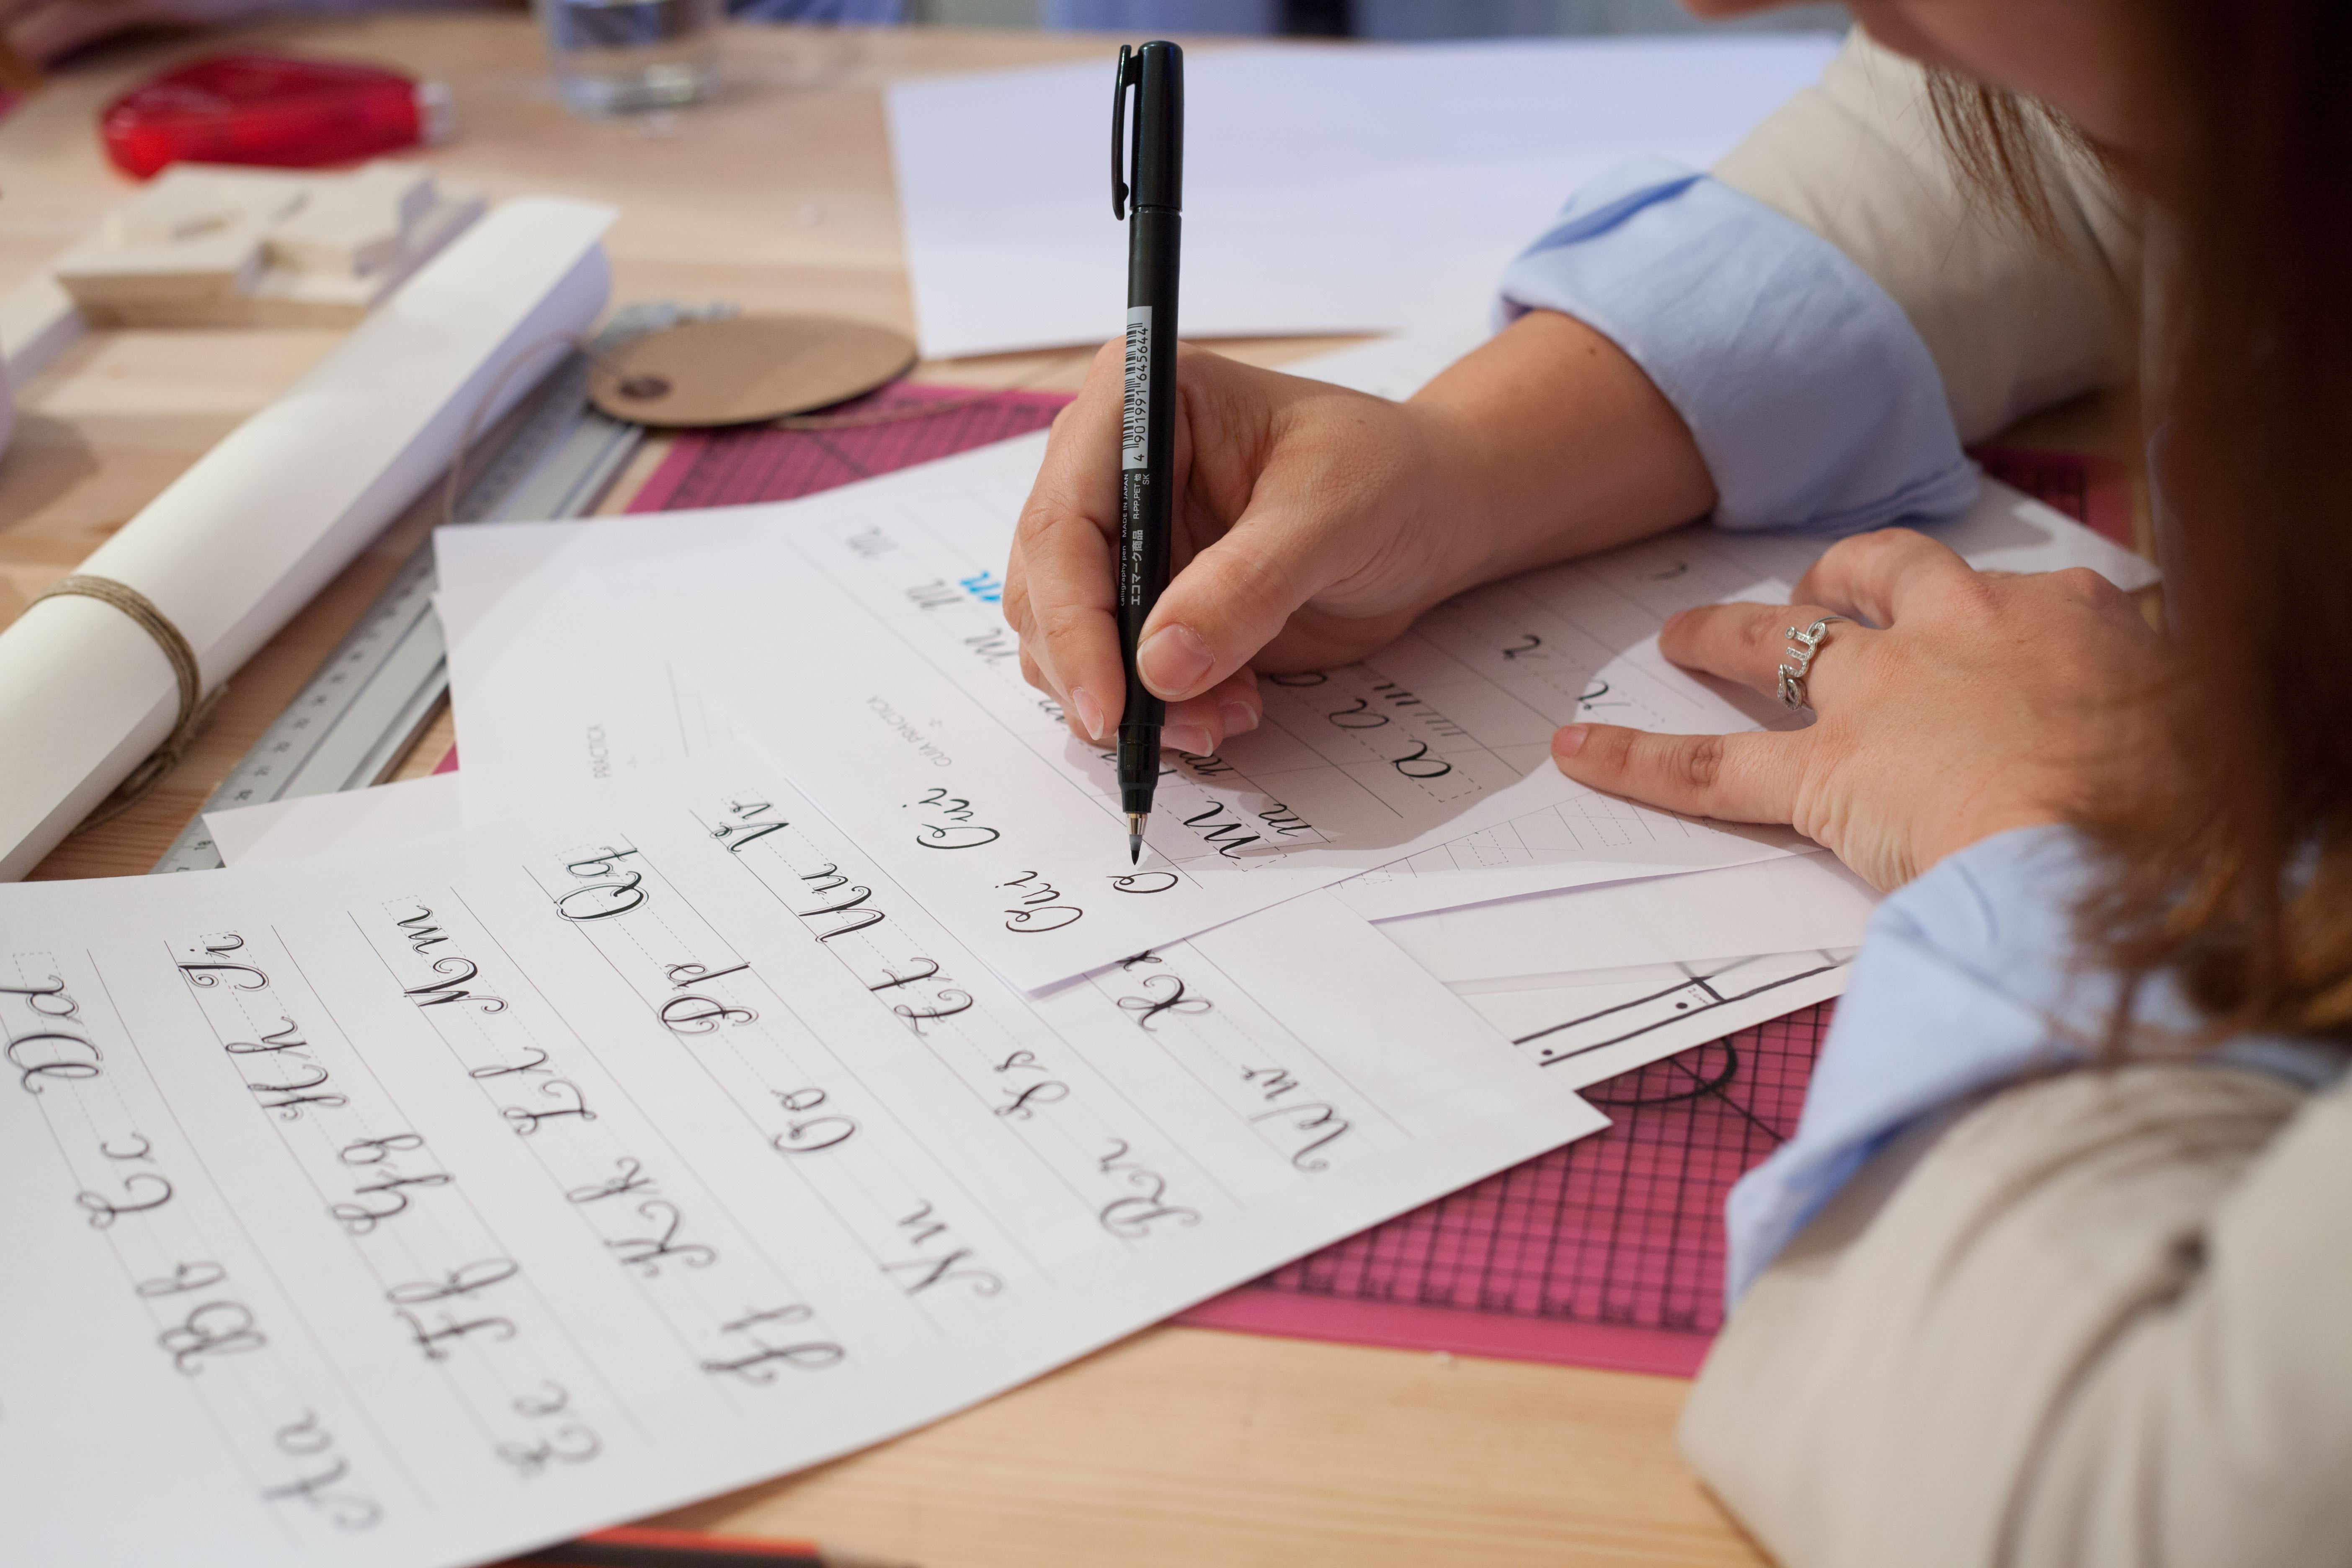 Oui Oui-mi evento handmade-lettering bodas-packaging bodas-centros flores diy (39)